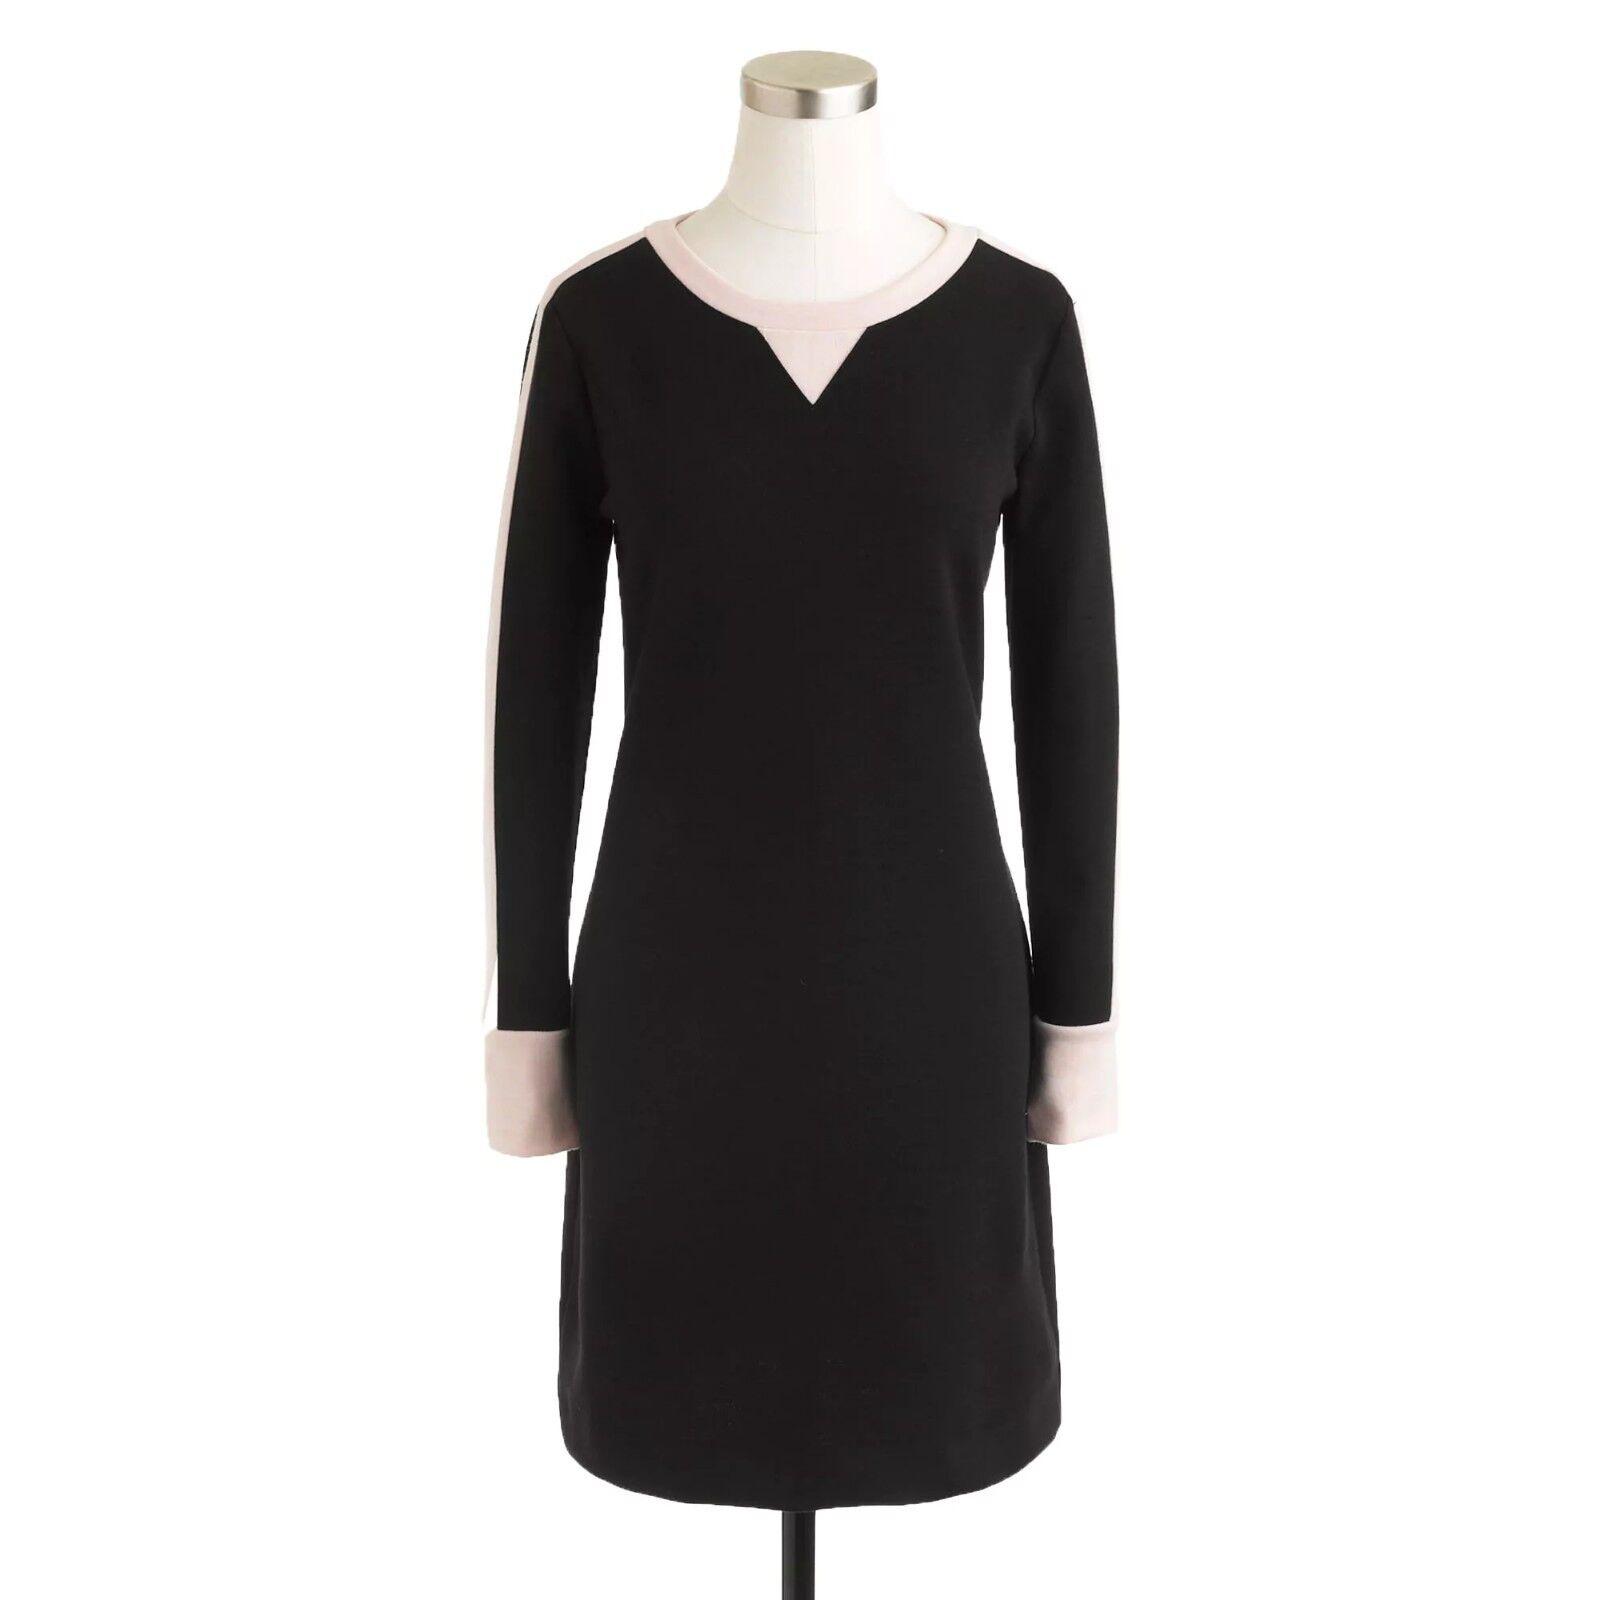 New J CREW schwarz Rosa KNIT SWEATSHIRT DRESS Sz 2 Item 07199 Long Sleeve